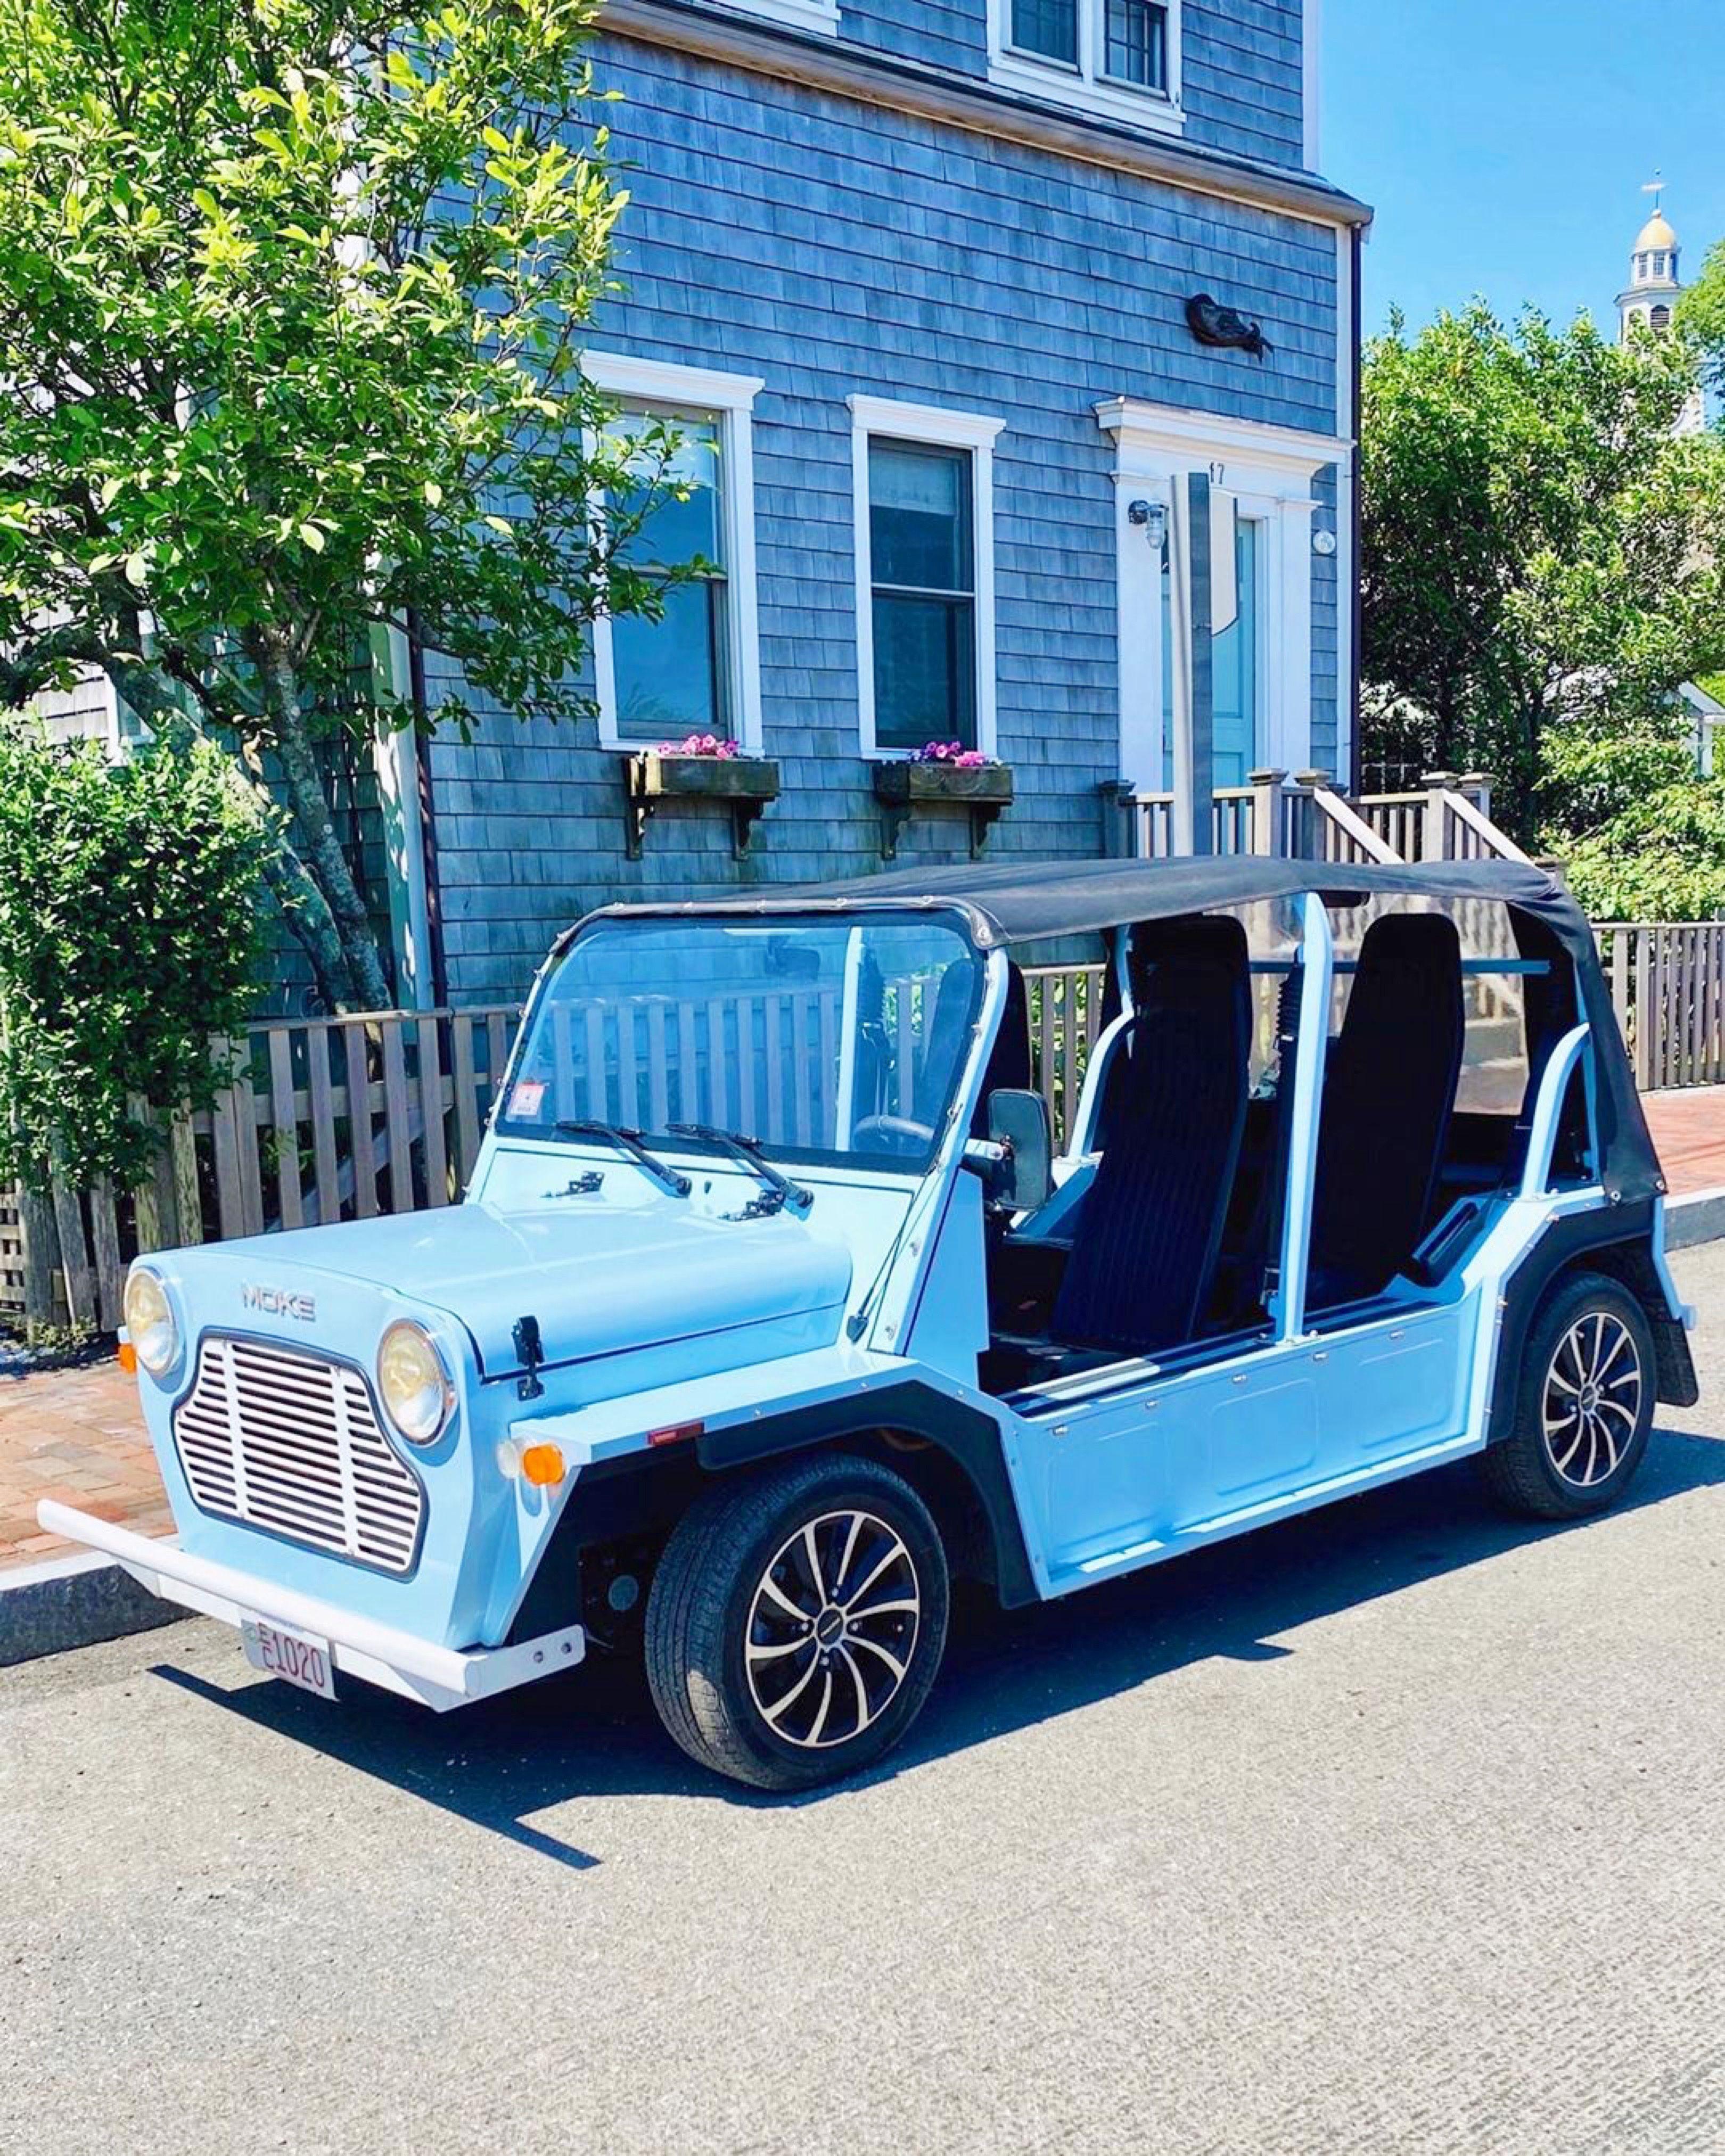 Moking around #Nantucket 🚙💨   #MokeAmerica #ElectricCar #IslandVibes #Moke #MiniMoke